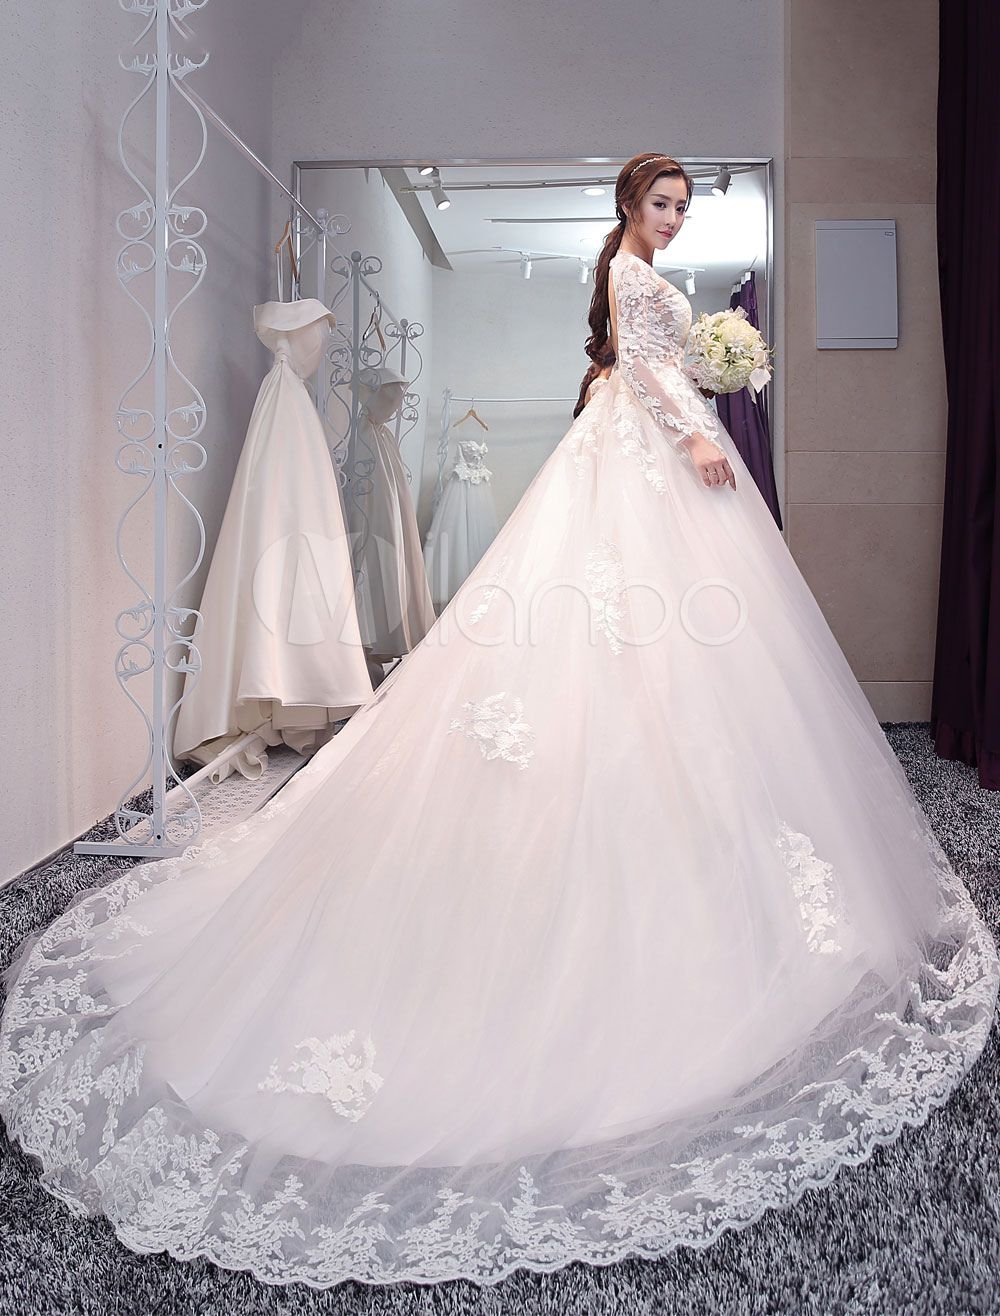 Princess wedding dresses long sleeve bridal dresses lace backless